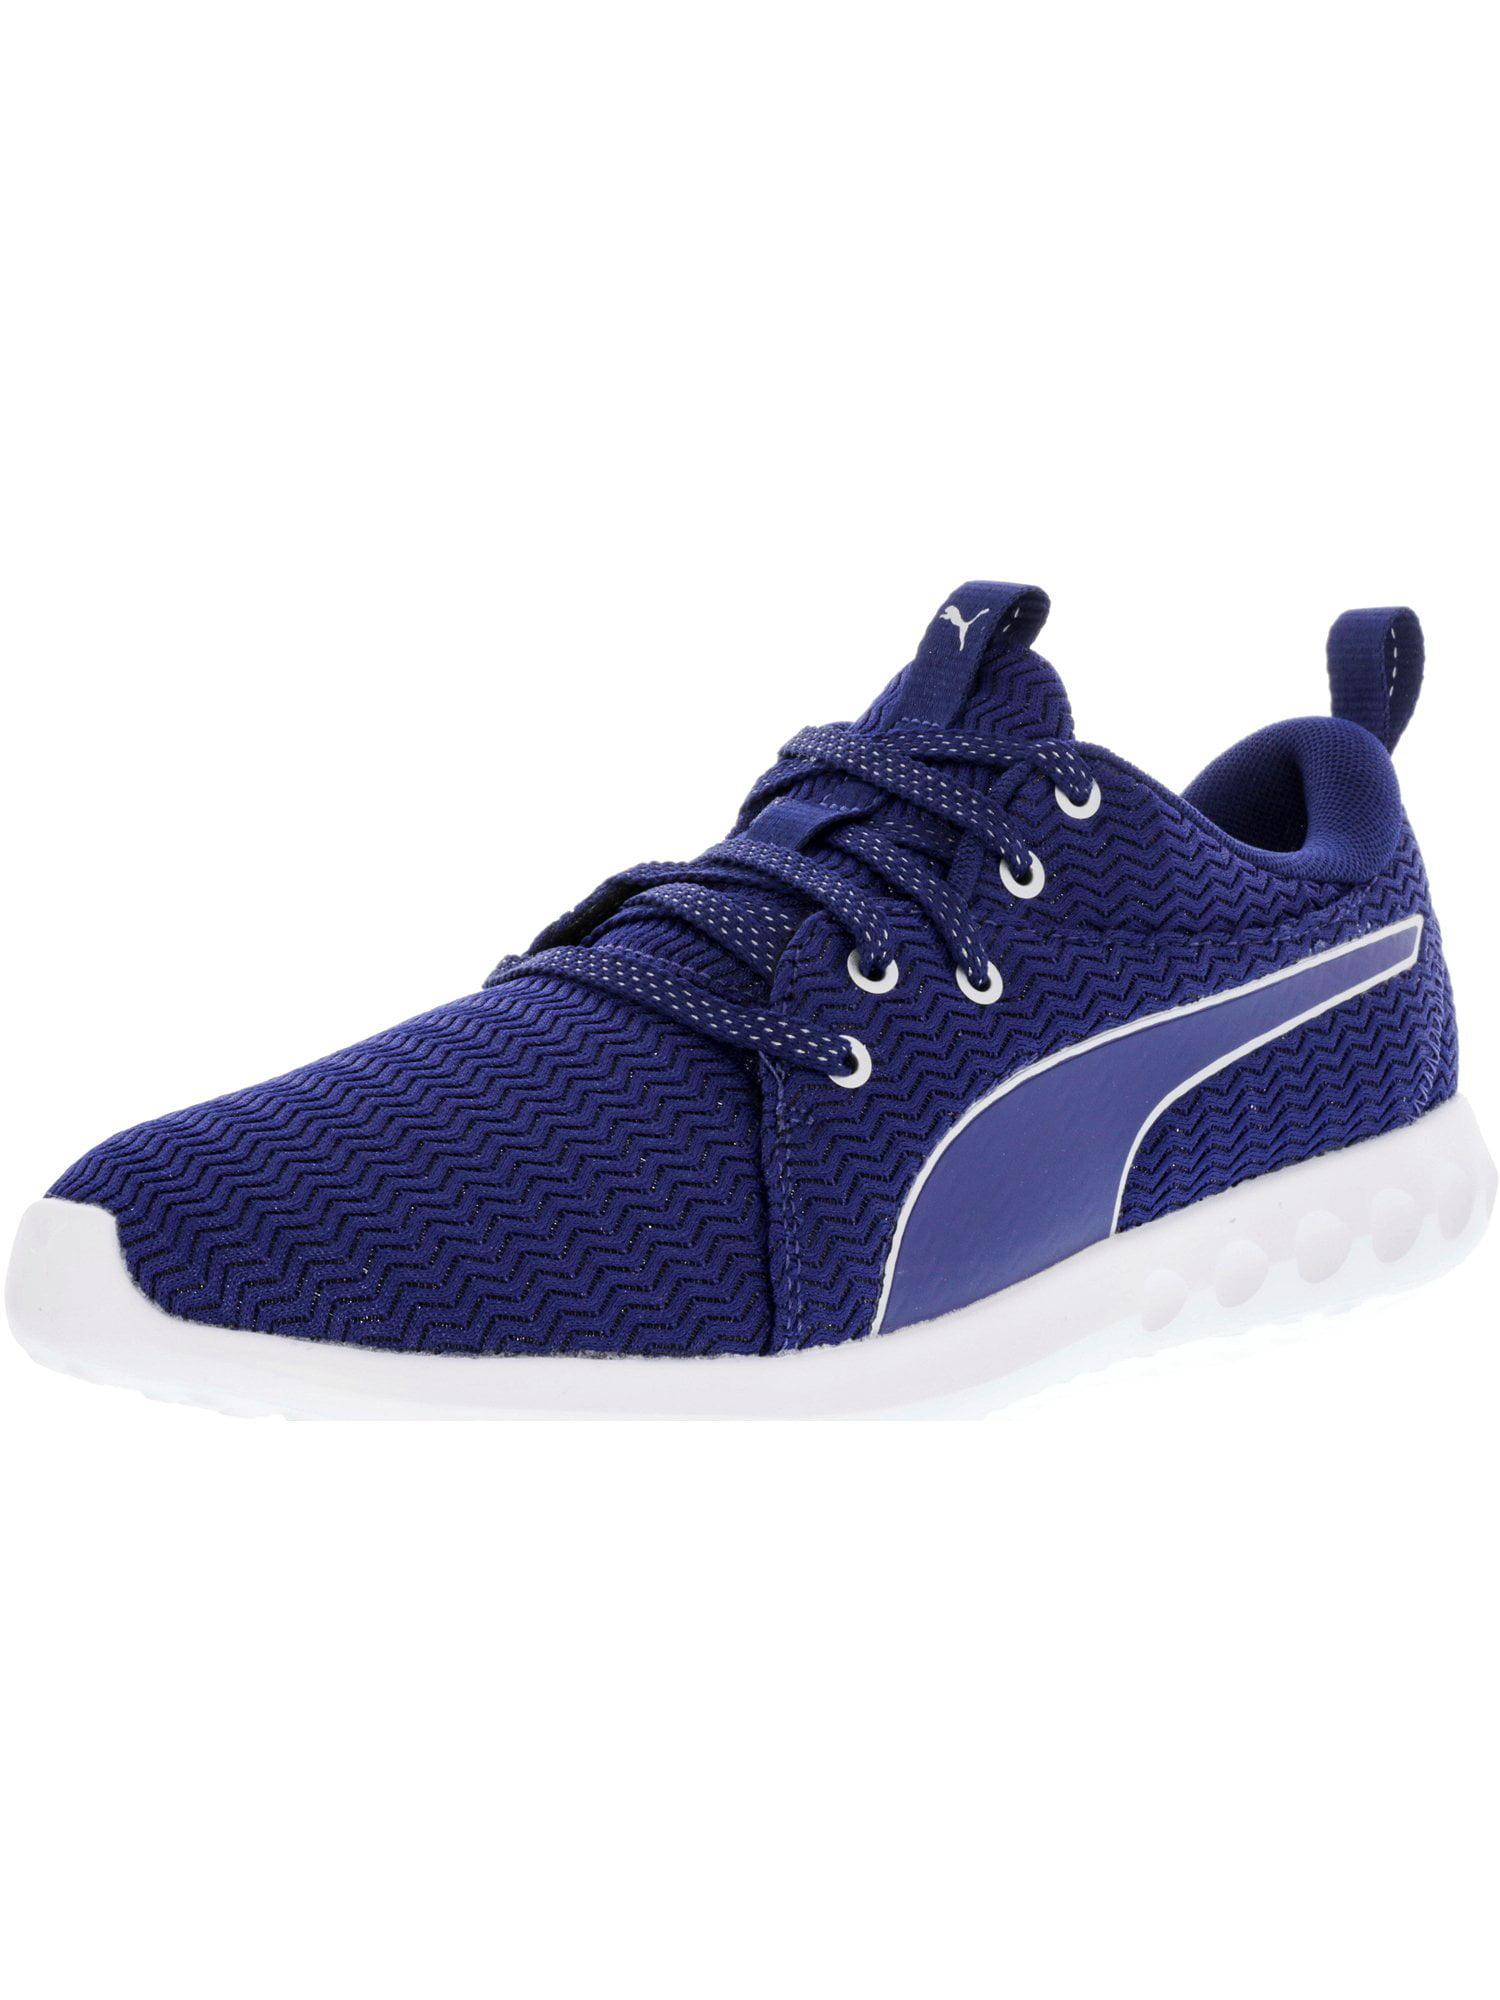 Puma Women's Carson 2 Metallic Blue Depths / Silver Ankle-High Running Shoe - 7M